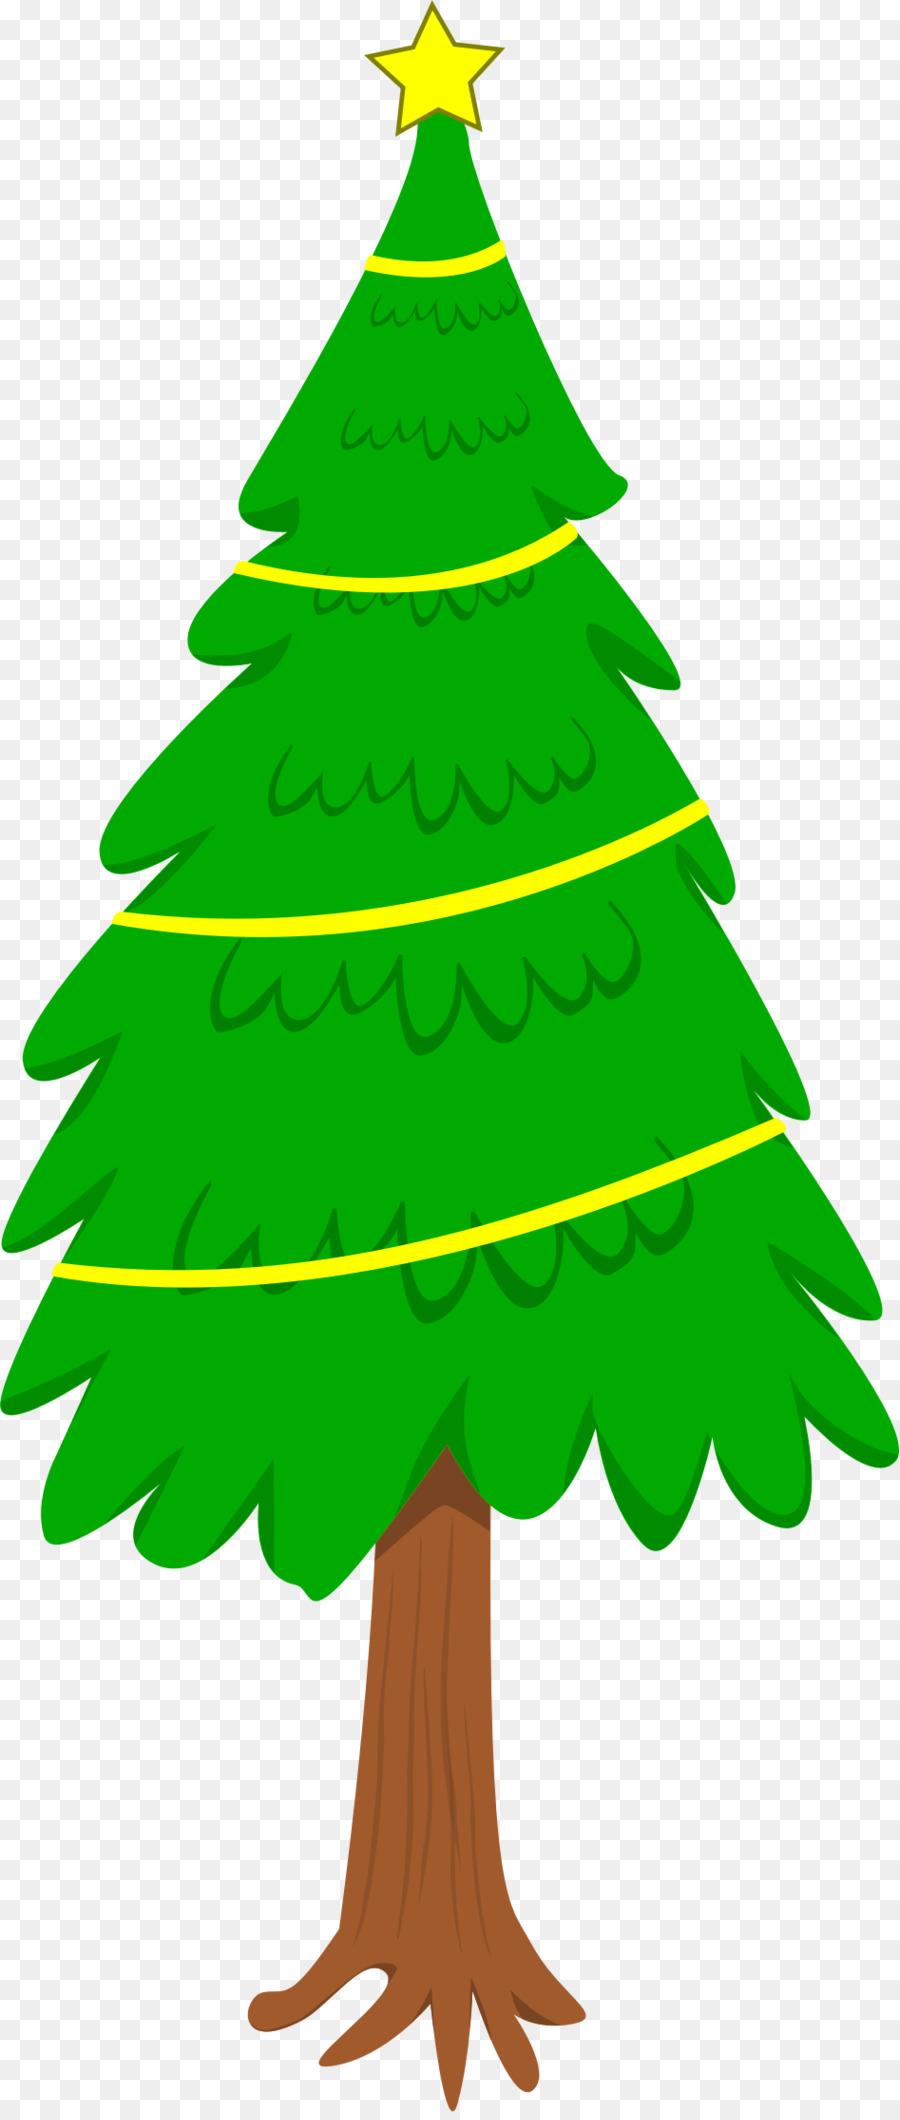 Tall Christmas Tree Clipart.Christmas Tree Branch Clipart Tree Leaf Christmas